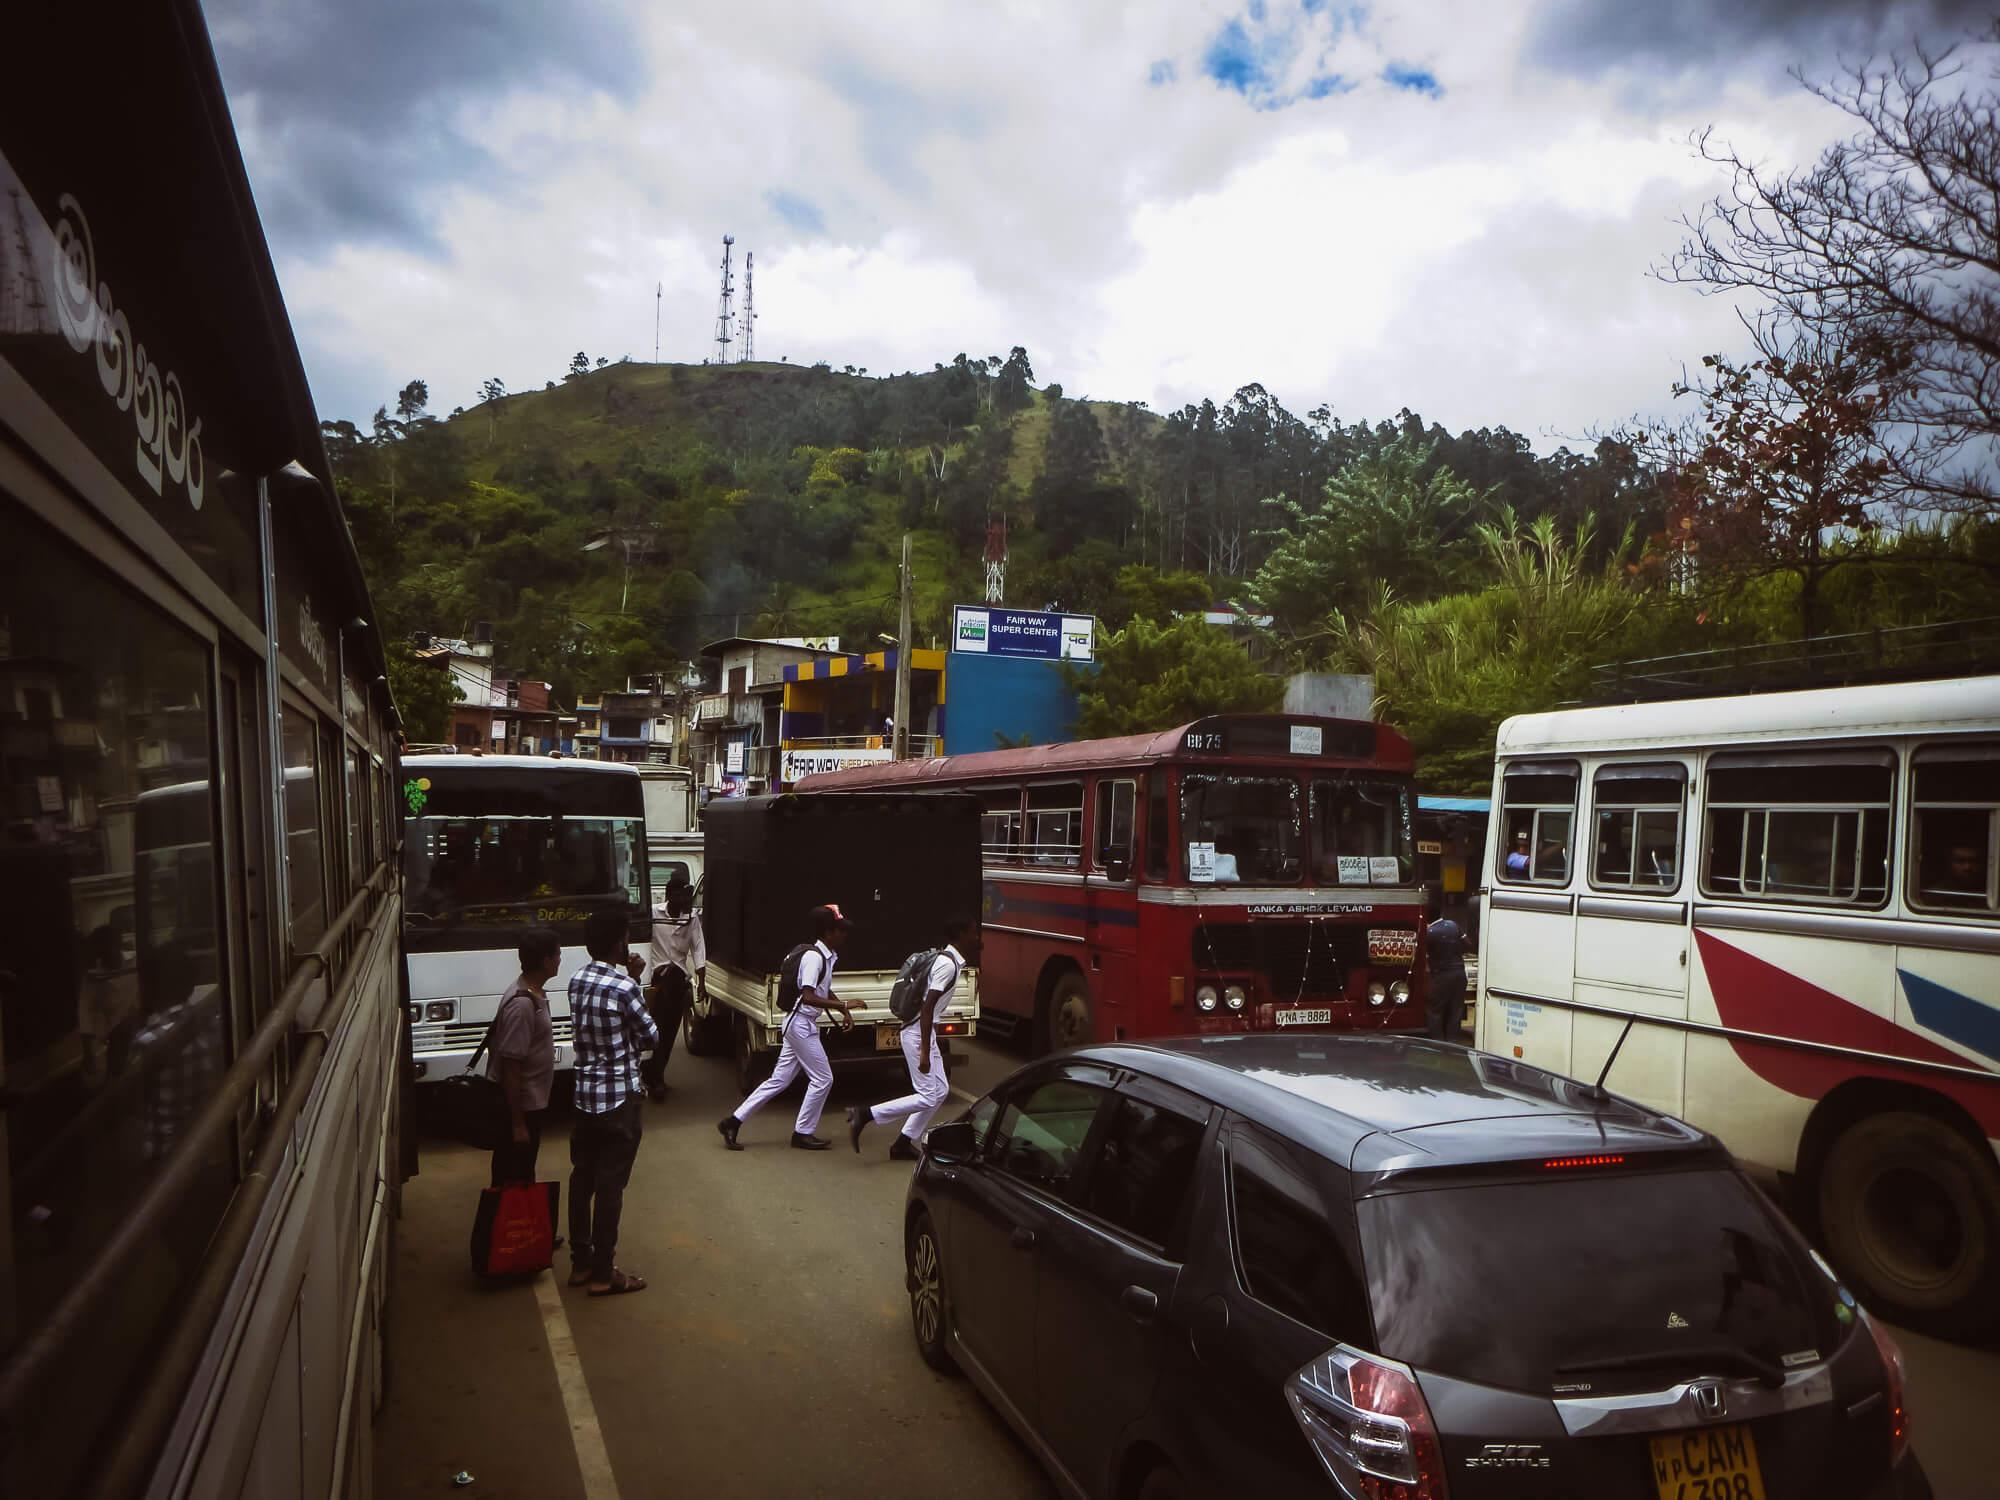 Two boyes in Sri Lanka cross a busy street full of buses